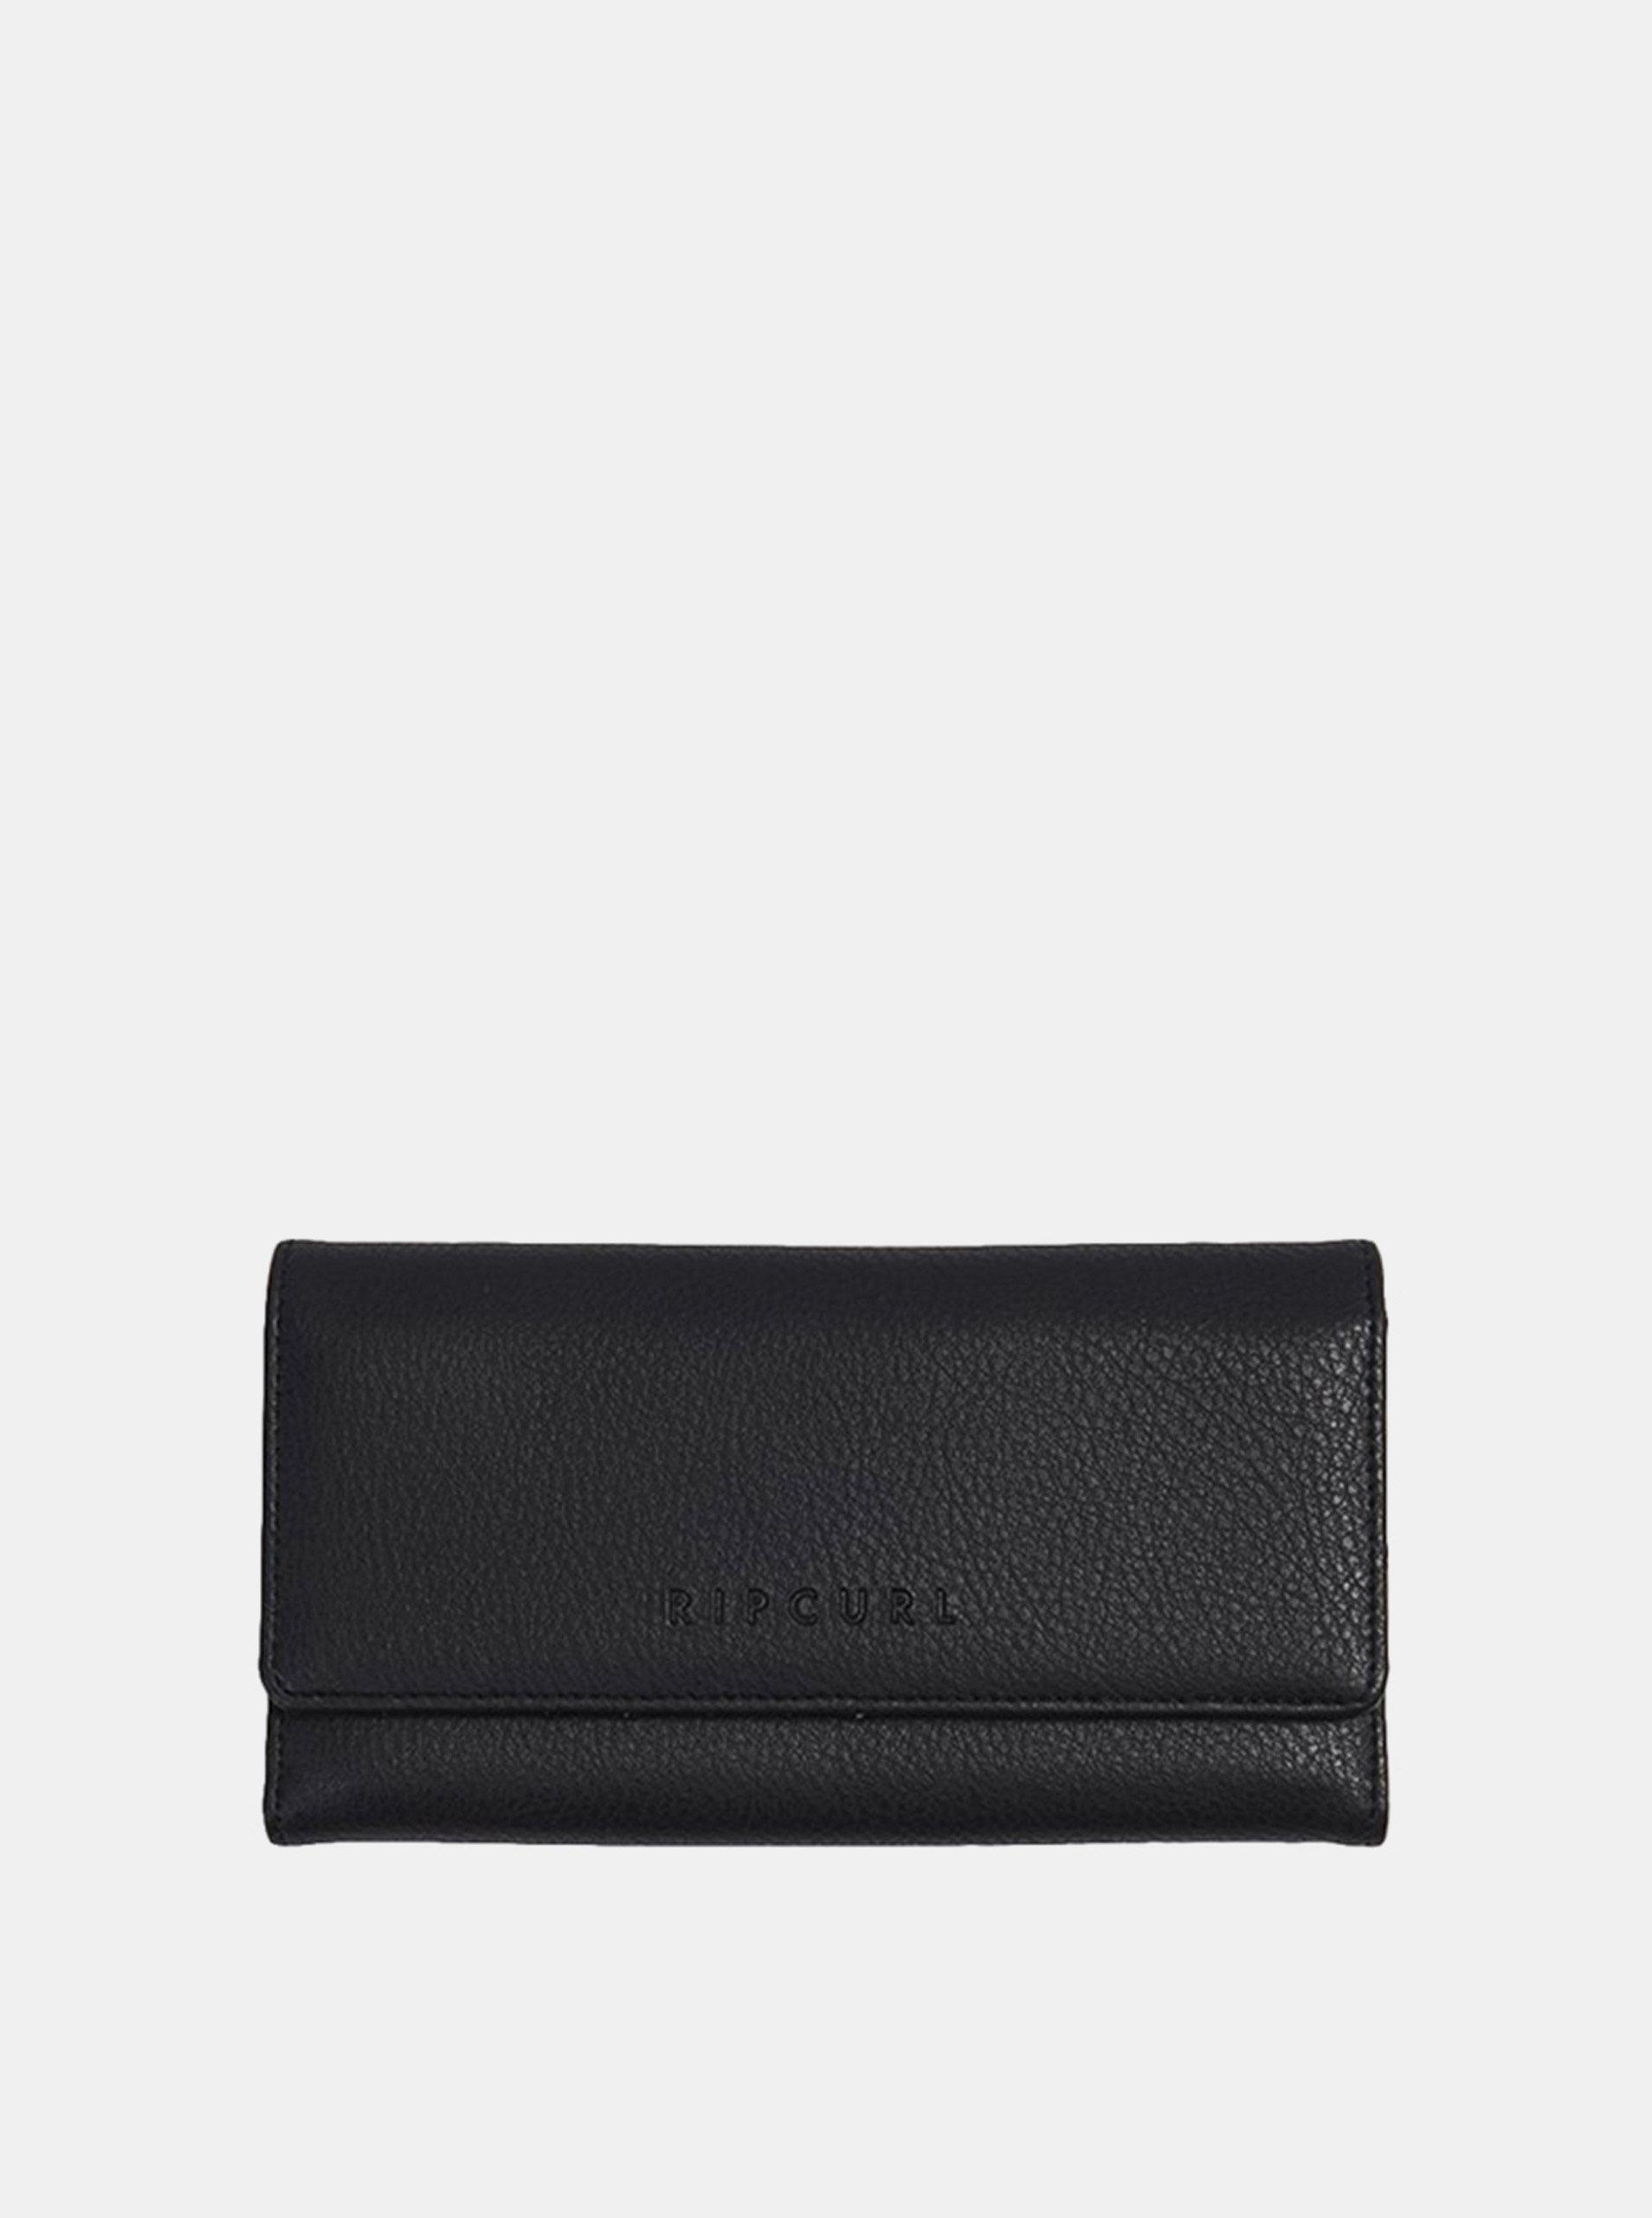 Rip Curl ESSENTIALS II PHONE black dámská značková peněženka - černá